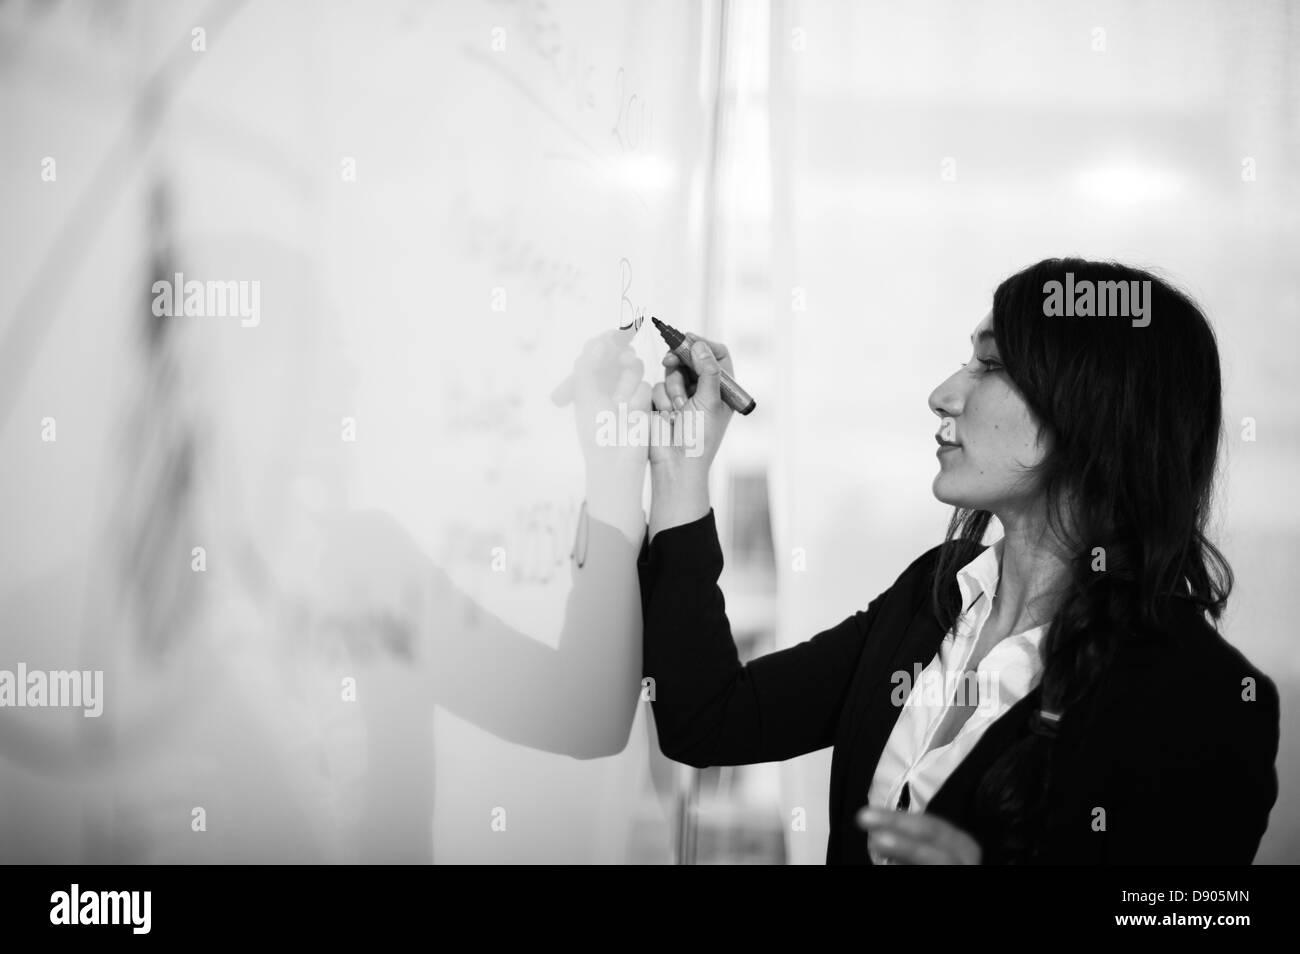 Woman writing on white board - Stock Image